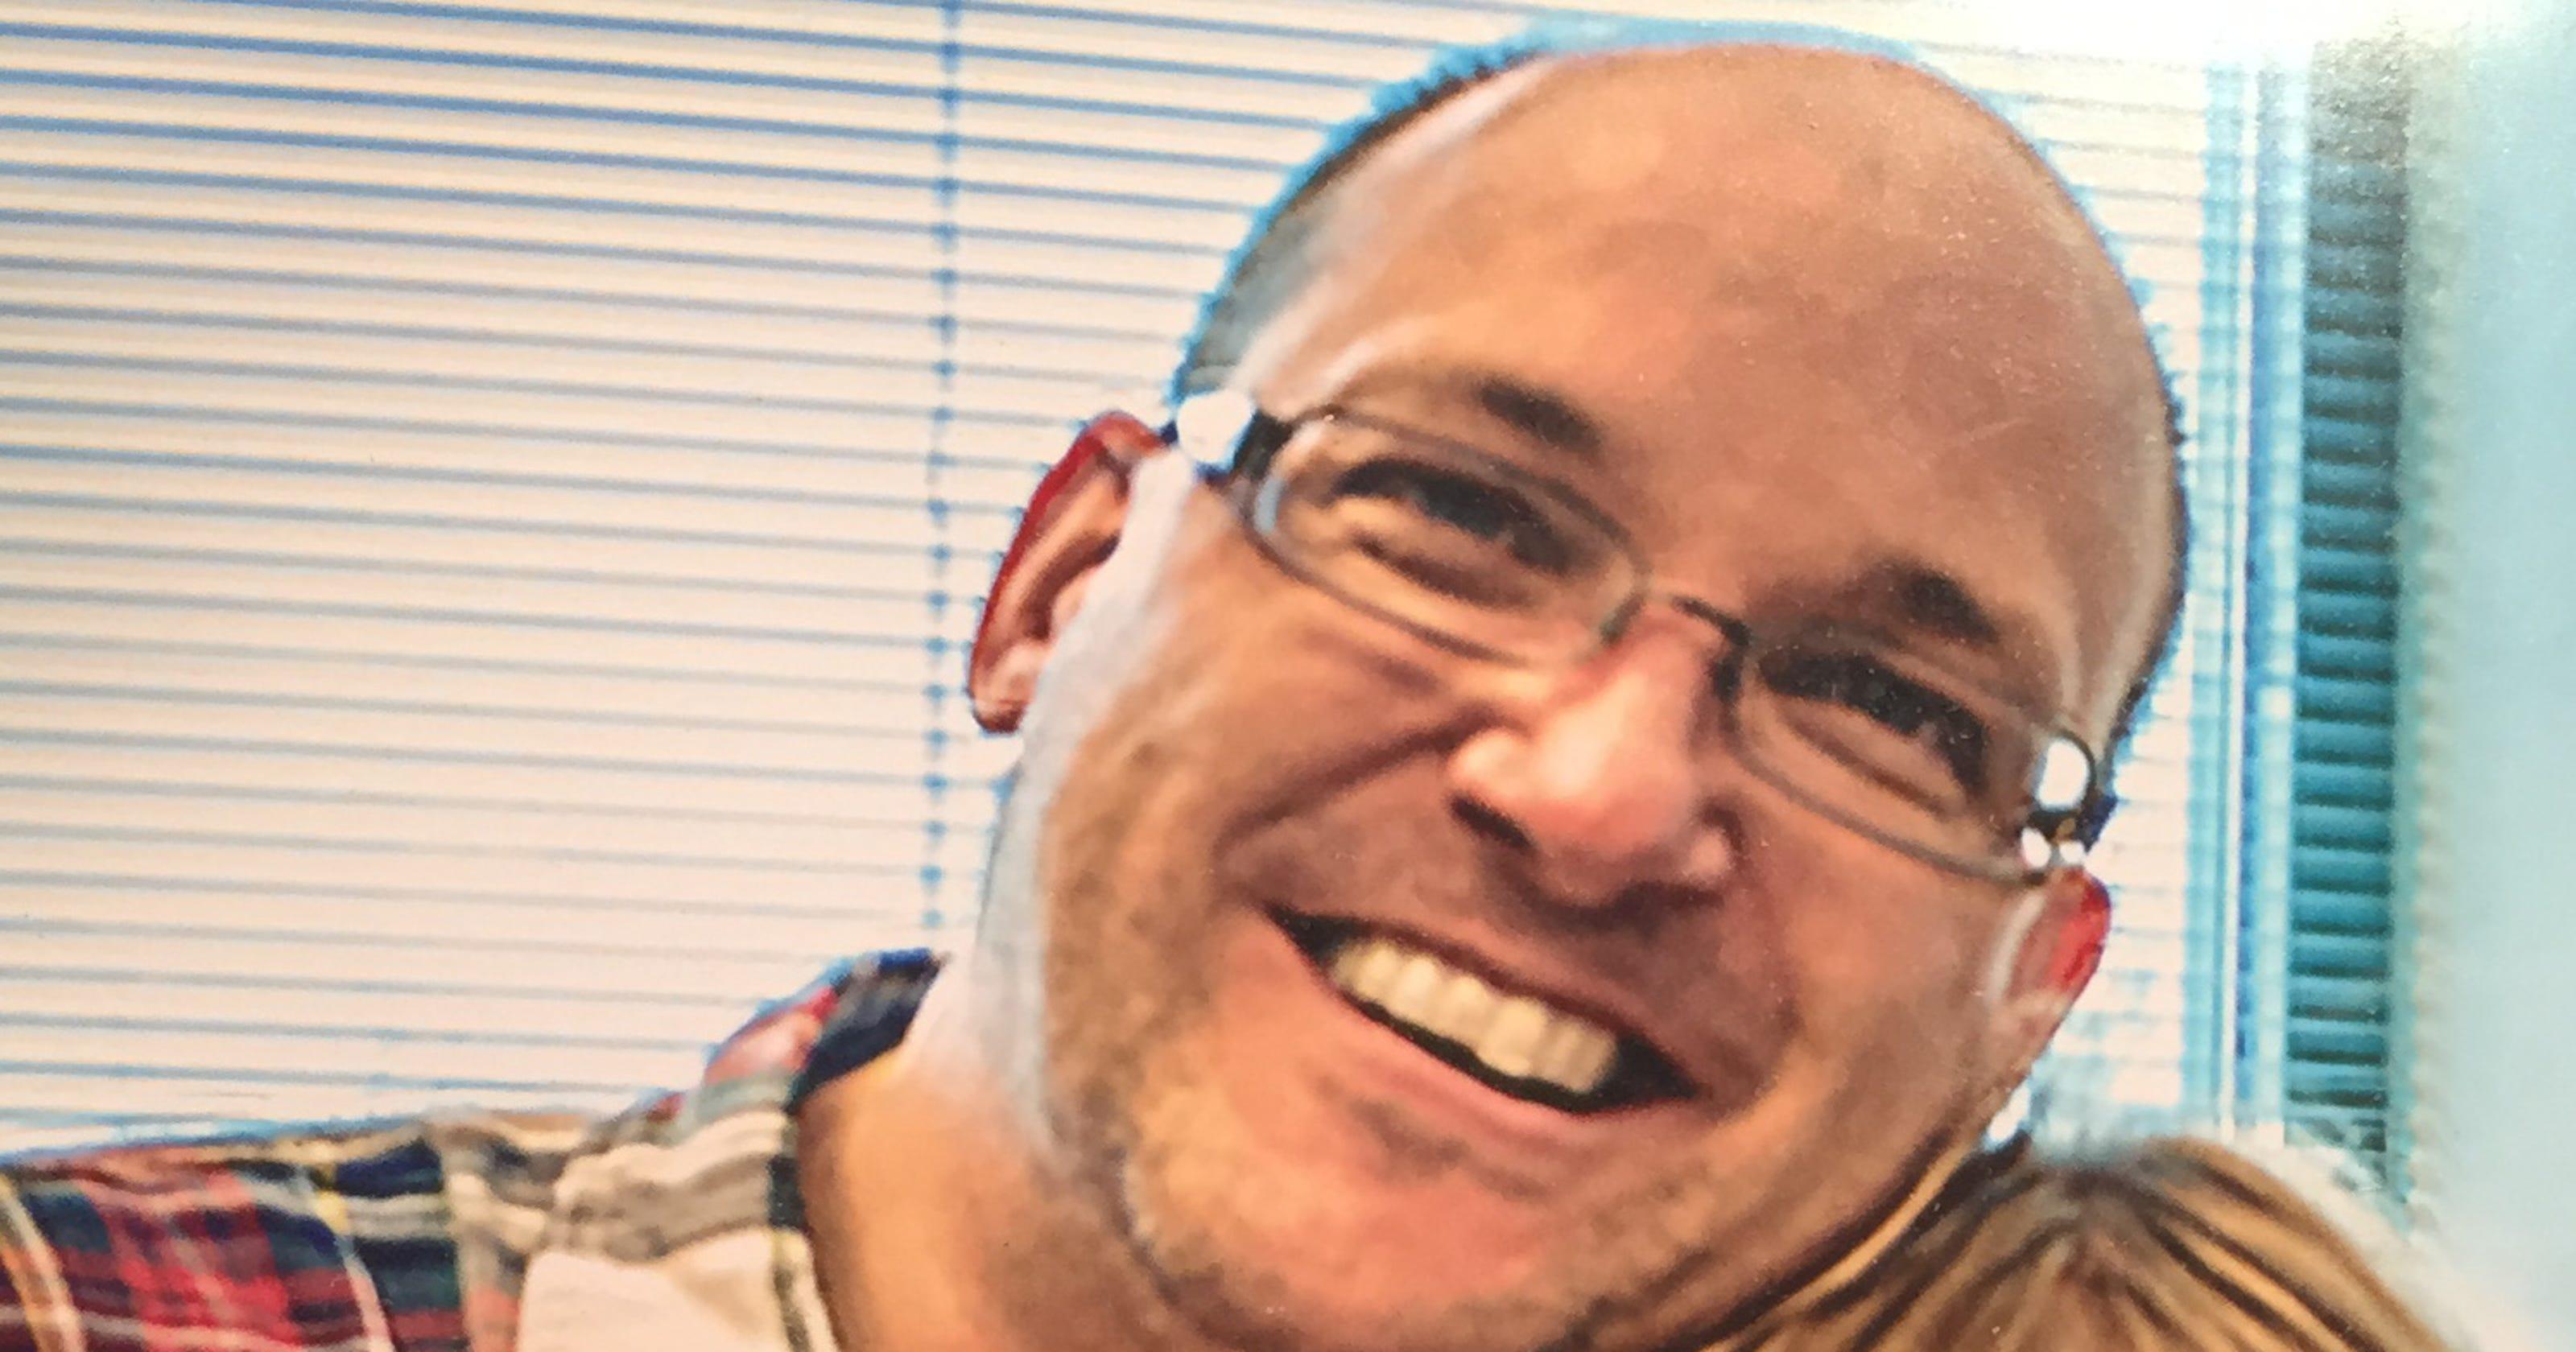 Craig Rideout murder: Where are Paul Tucci, Laura, Colin